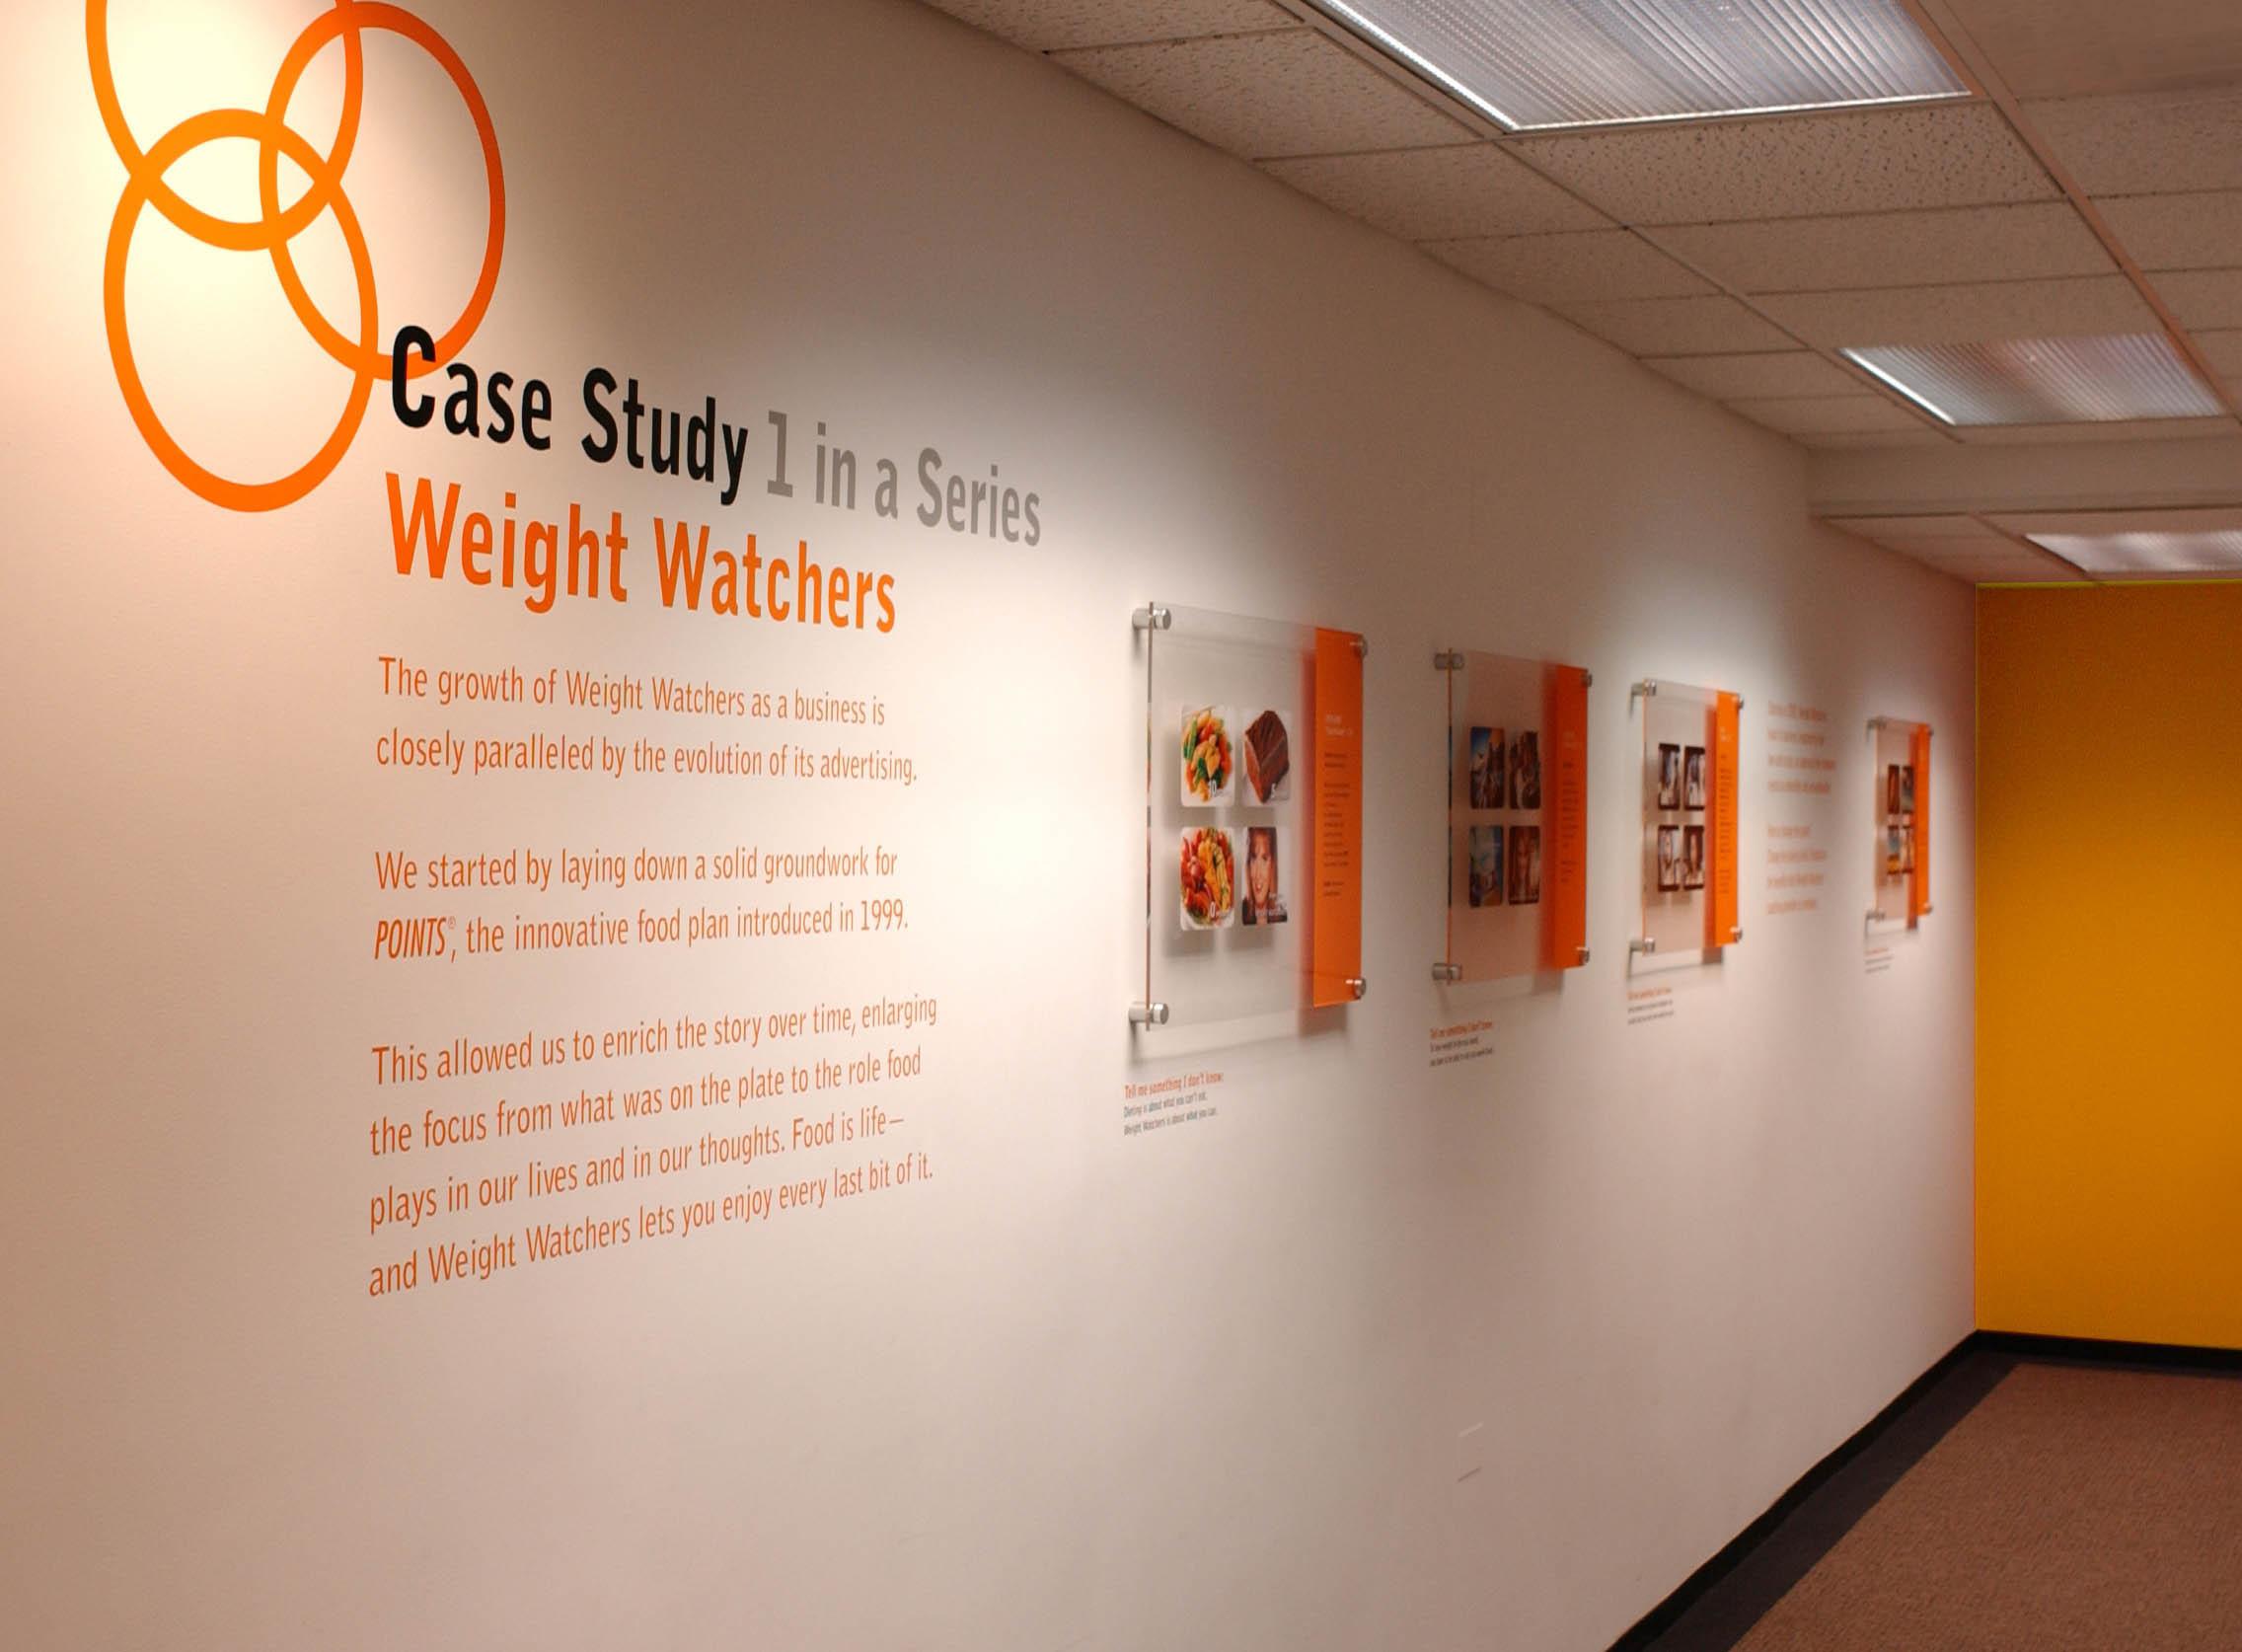 Case Study Gallery